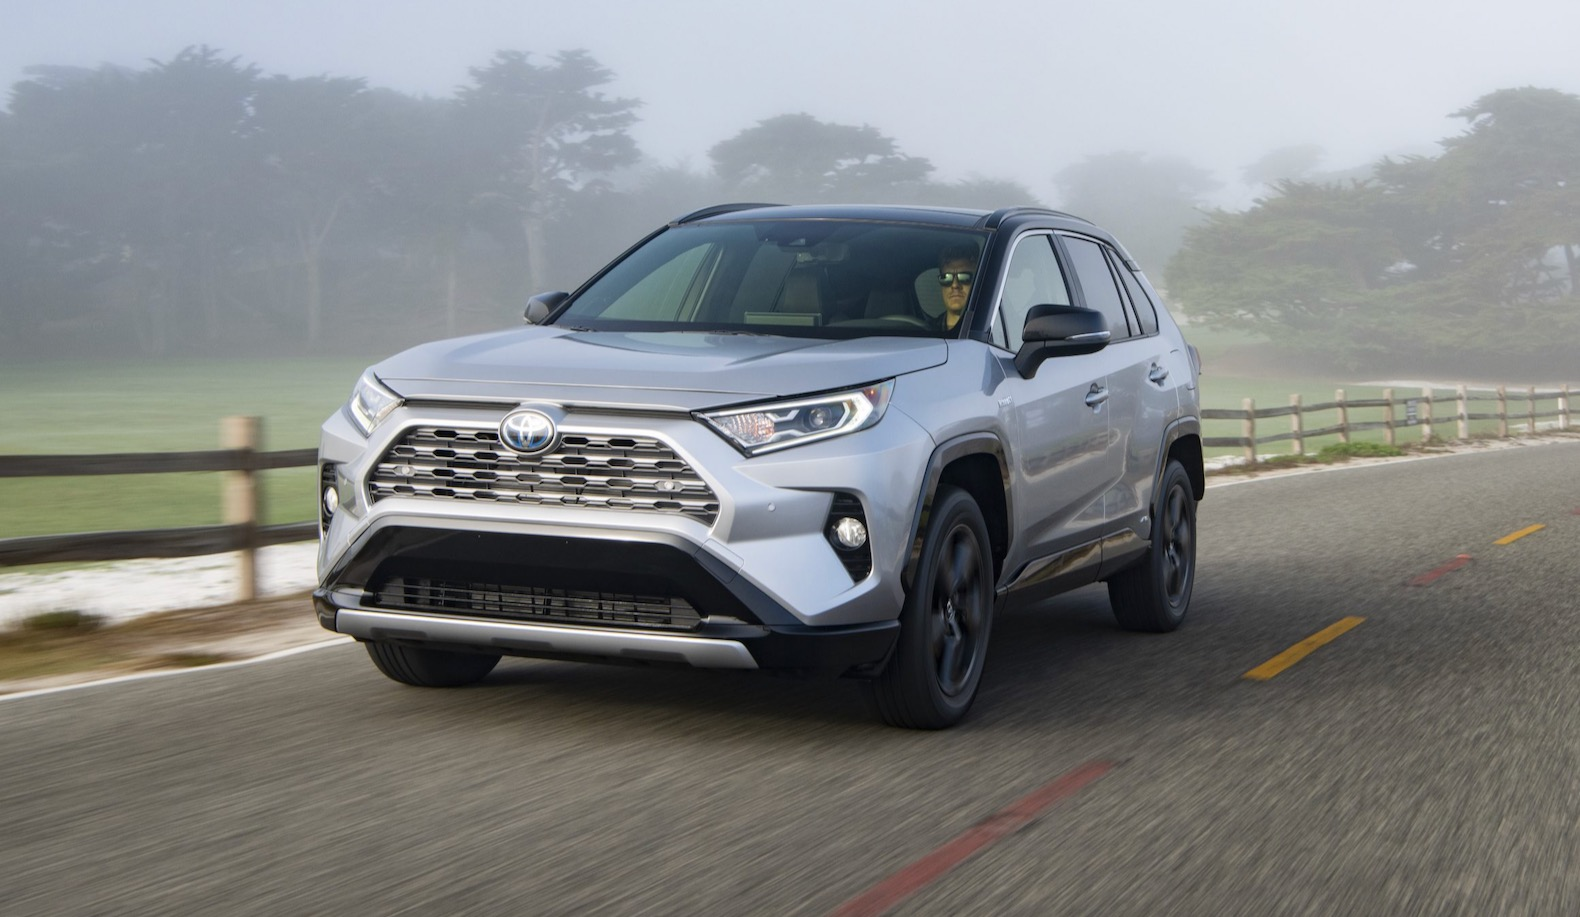 2020 toyota rav4 hybrid review: the hybrid crossover